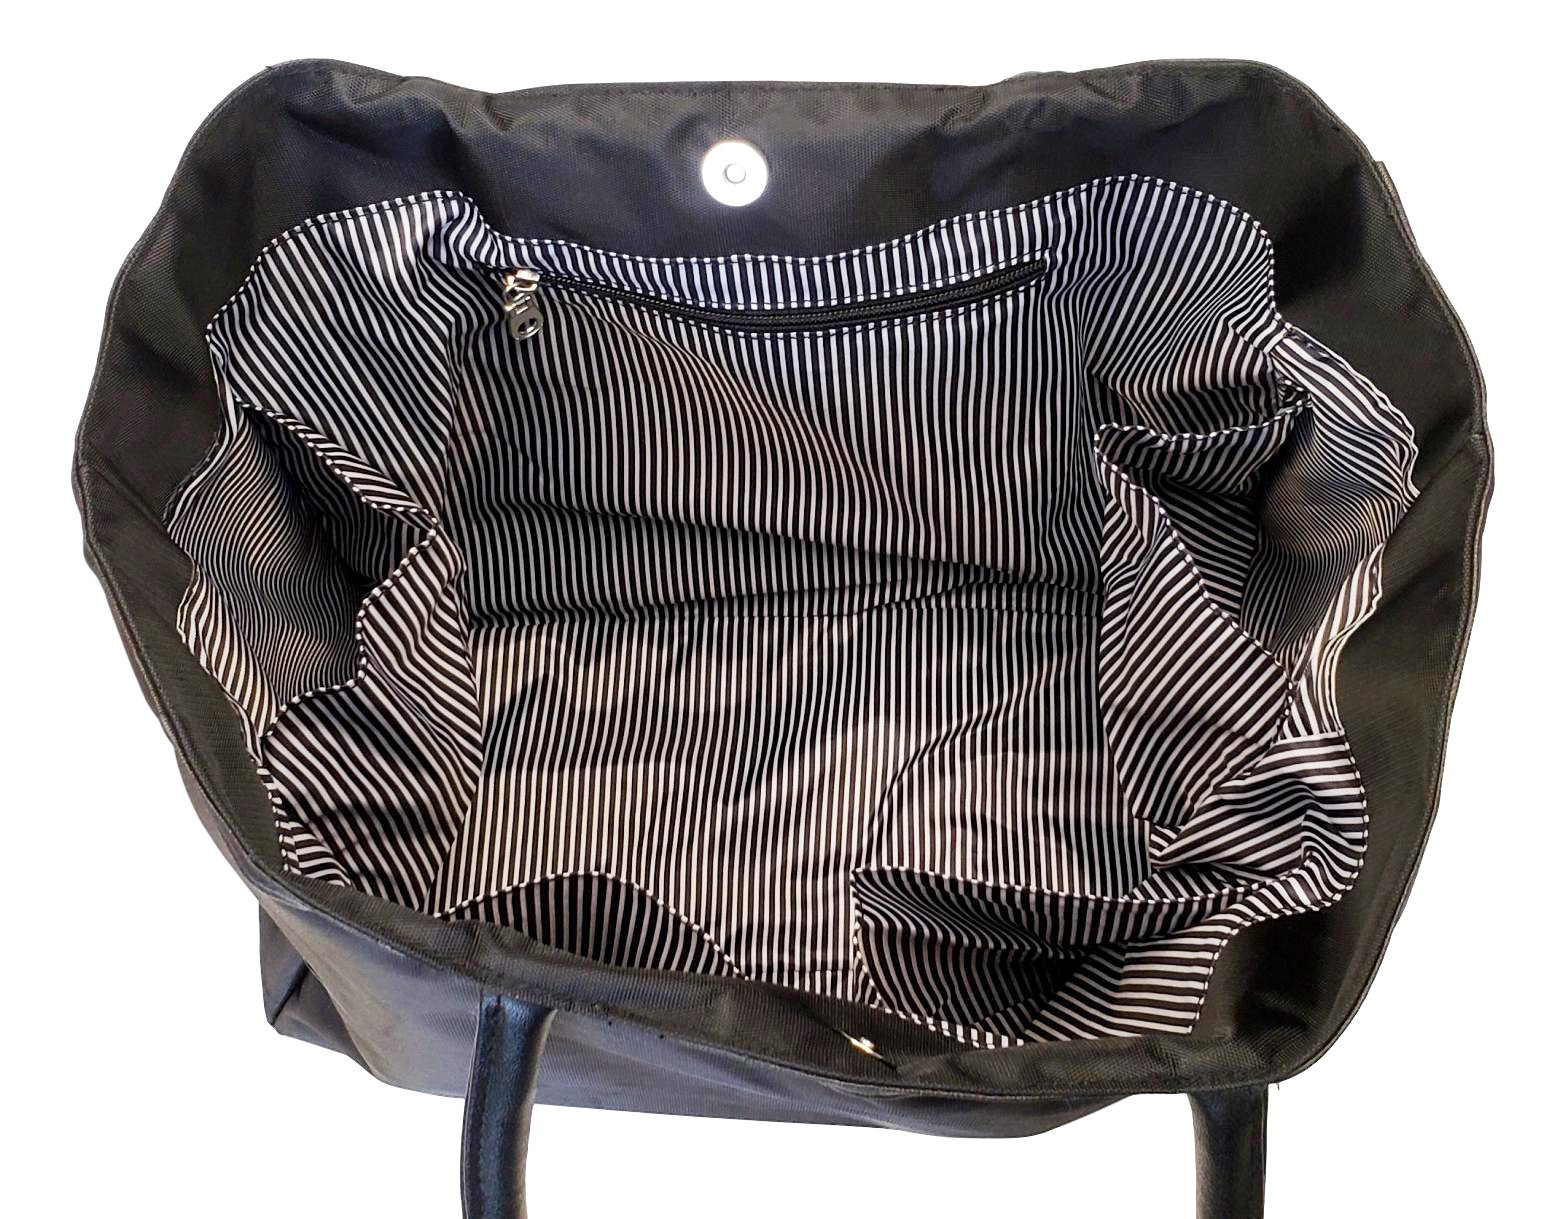 Large Black Organizing Travel Companion Purse Handbag Bag (No Embroidery - Black) by Sona G Designs (Image #4)